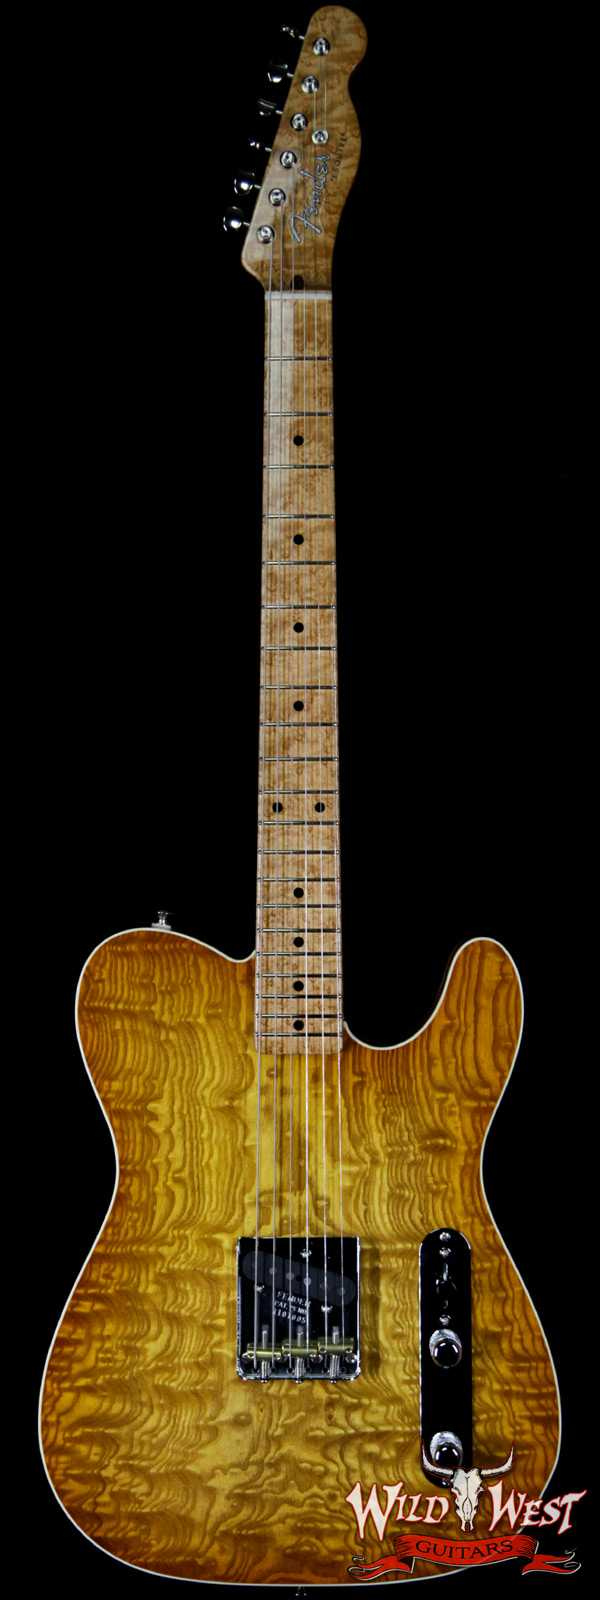 2020 NAMM Fender Custom Shop Prestige Dale Wilson Masterbuilt 1-Piece Tamo Ash Esquire NOS Honey Burst One of A Kind